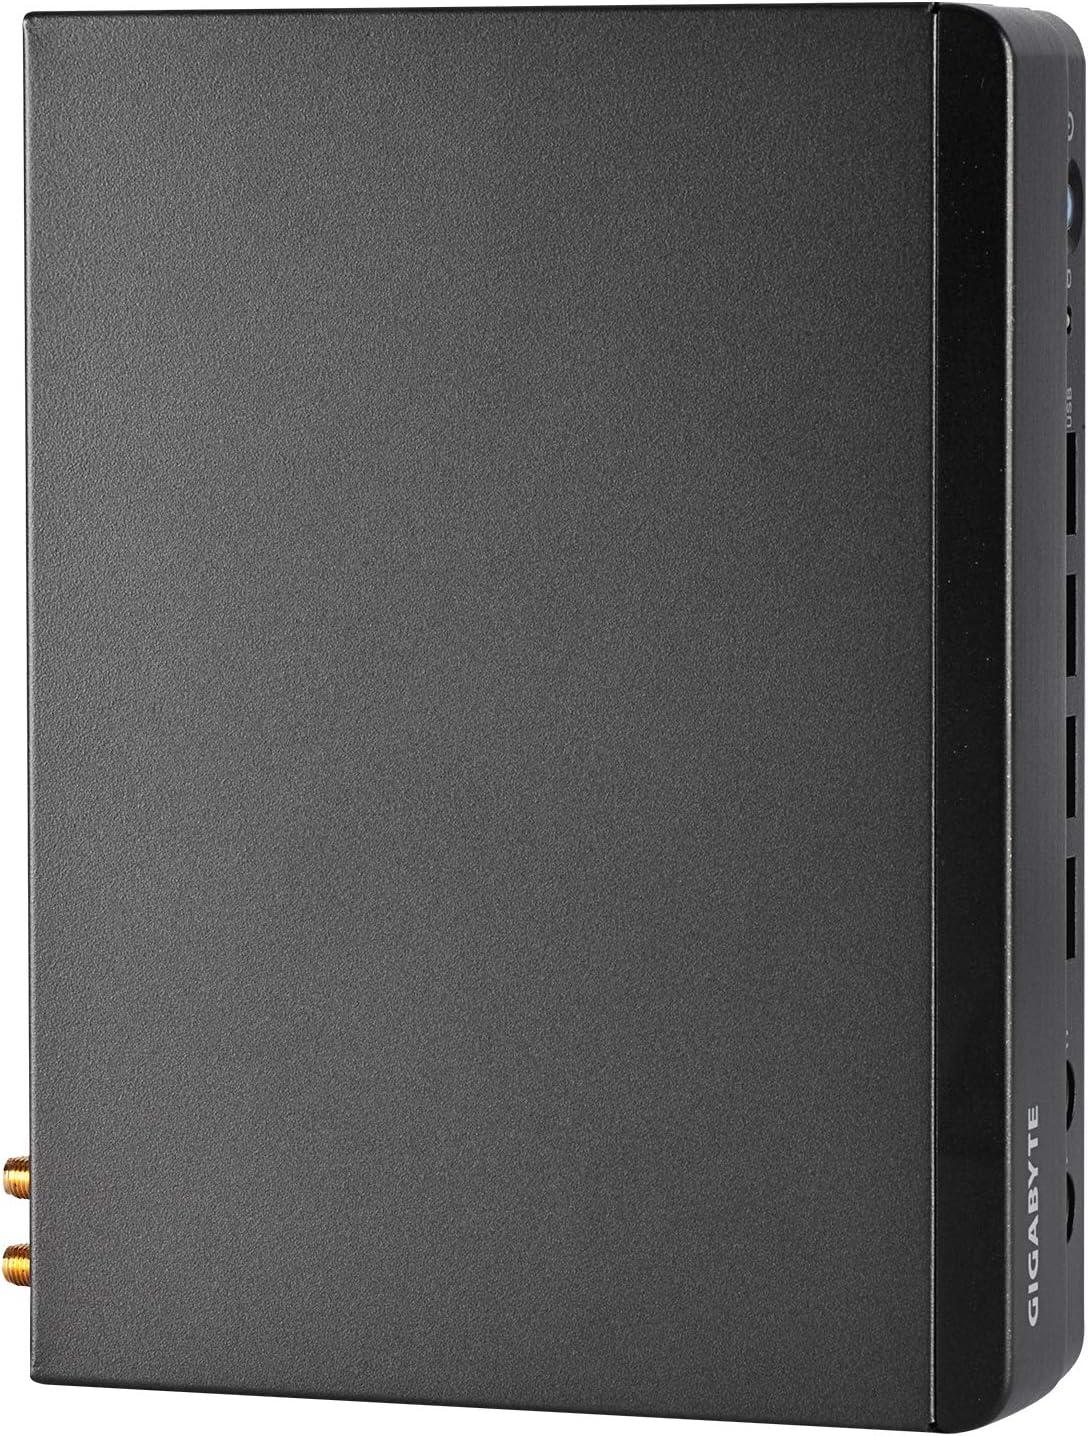 AMD Ryzen V1605B // Integrated Radeon Vega 8 Graphics//Gigabit LAN//Bluetooth//WiFi//HDMI//USB 3.2 GIGABYTE BRIX Ultra Compact Mini-PC GB-BSRE-1605